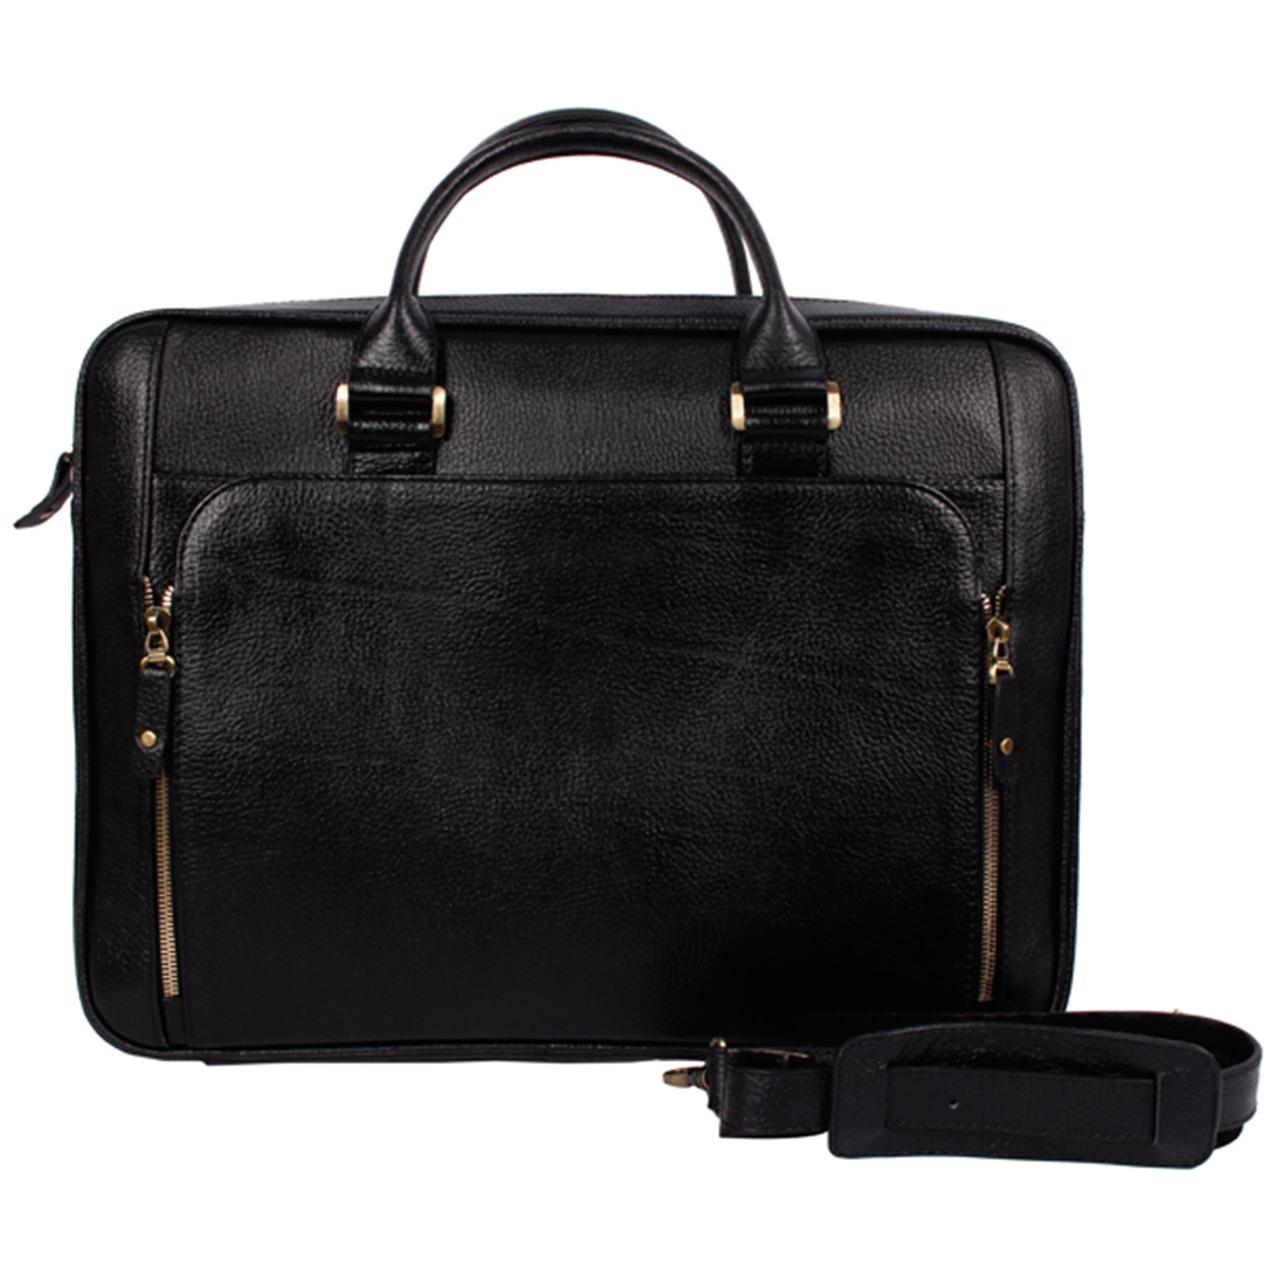 کیف اداری  رویال چرم کدBL22-Black